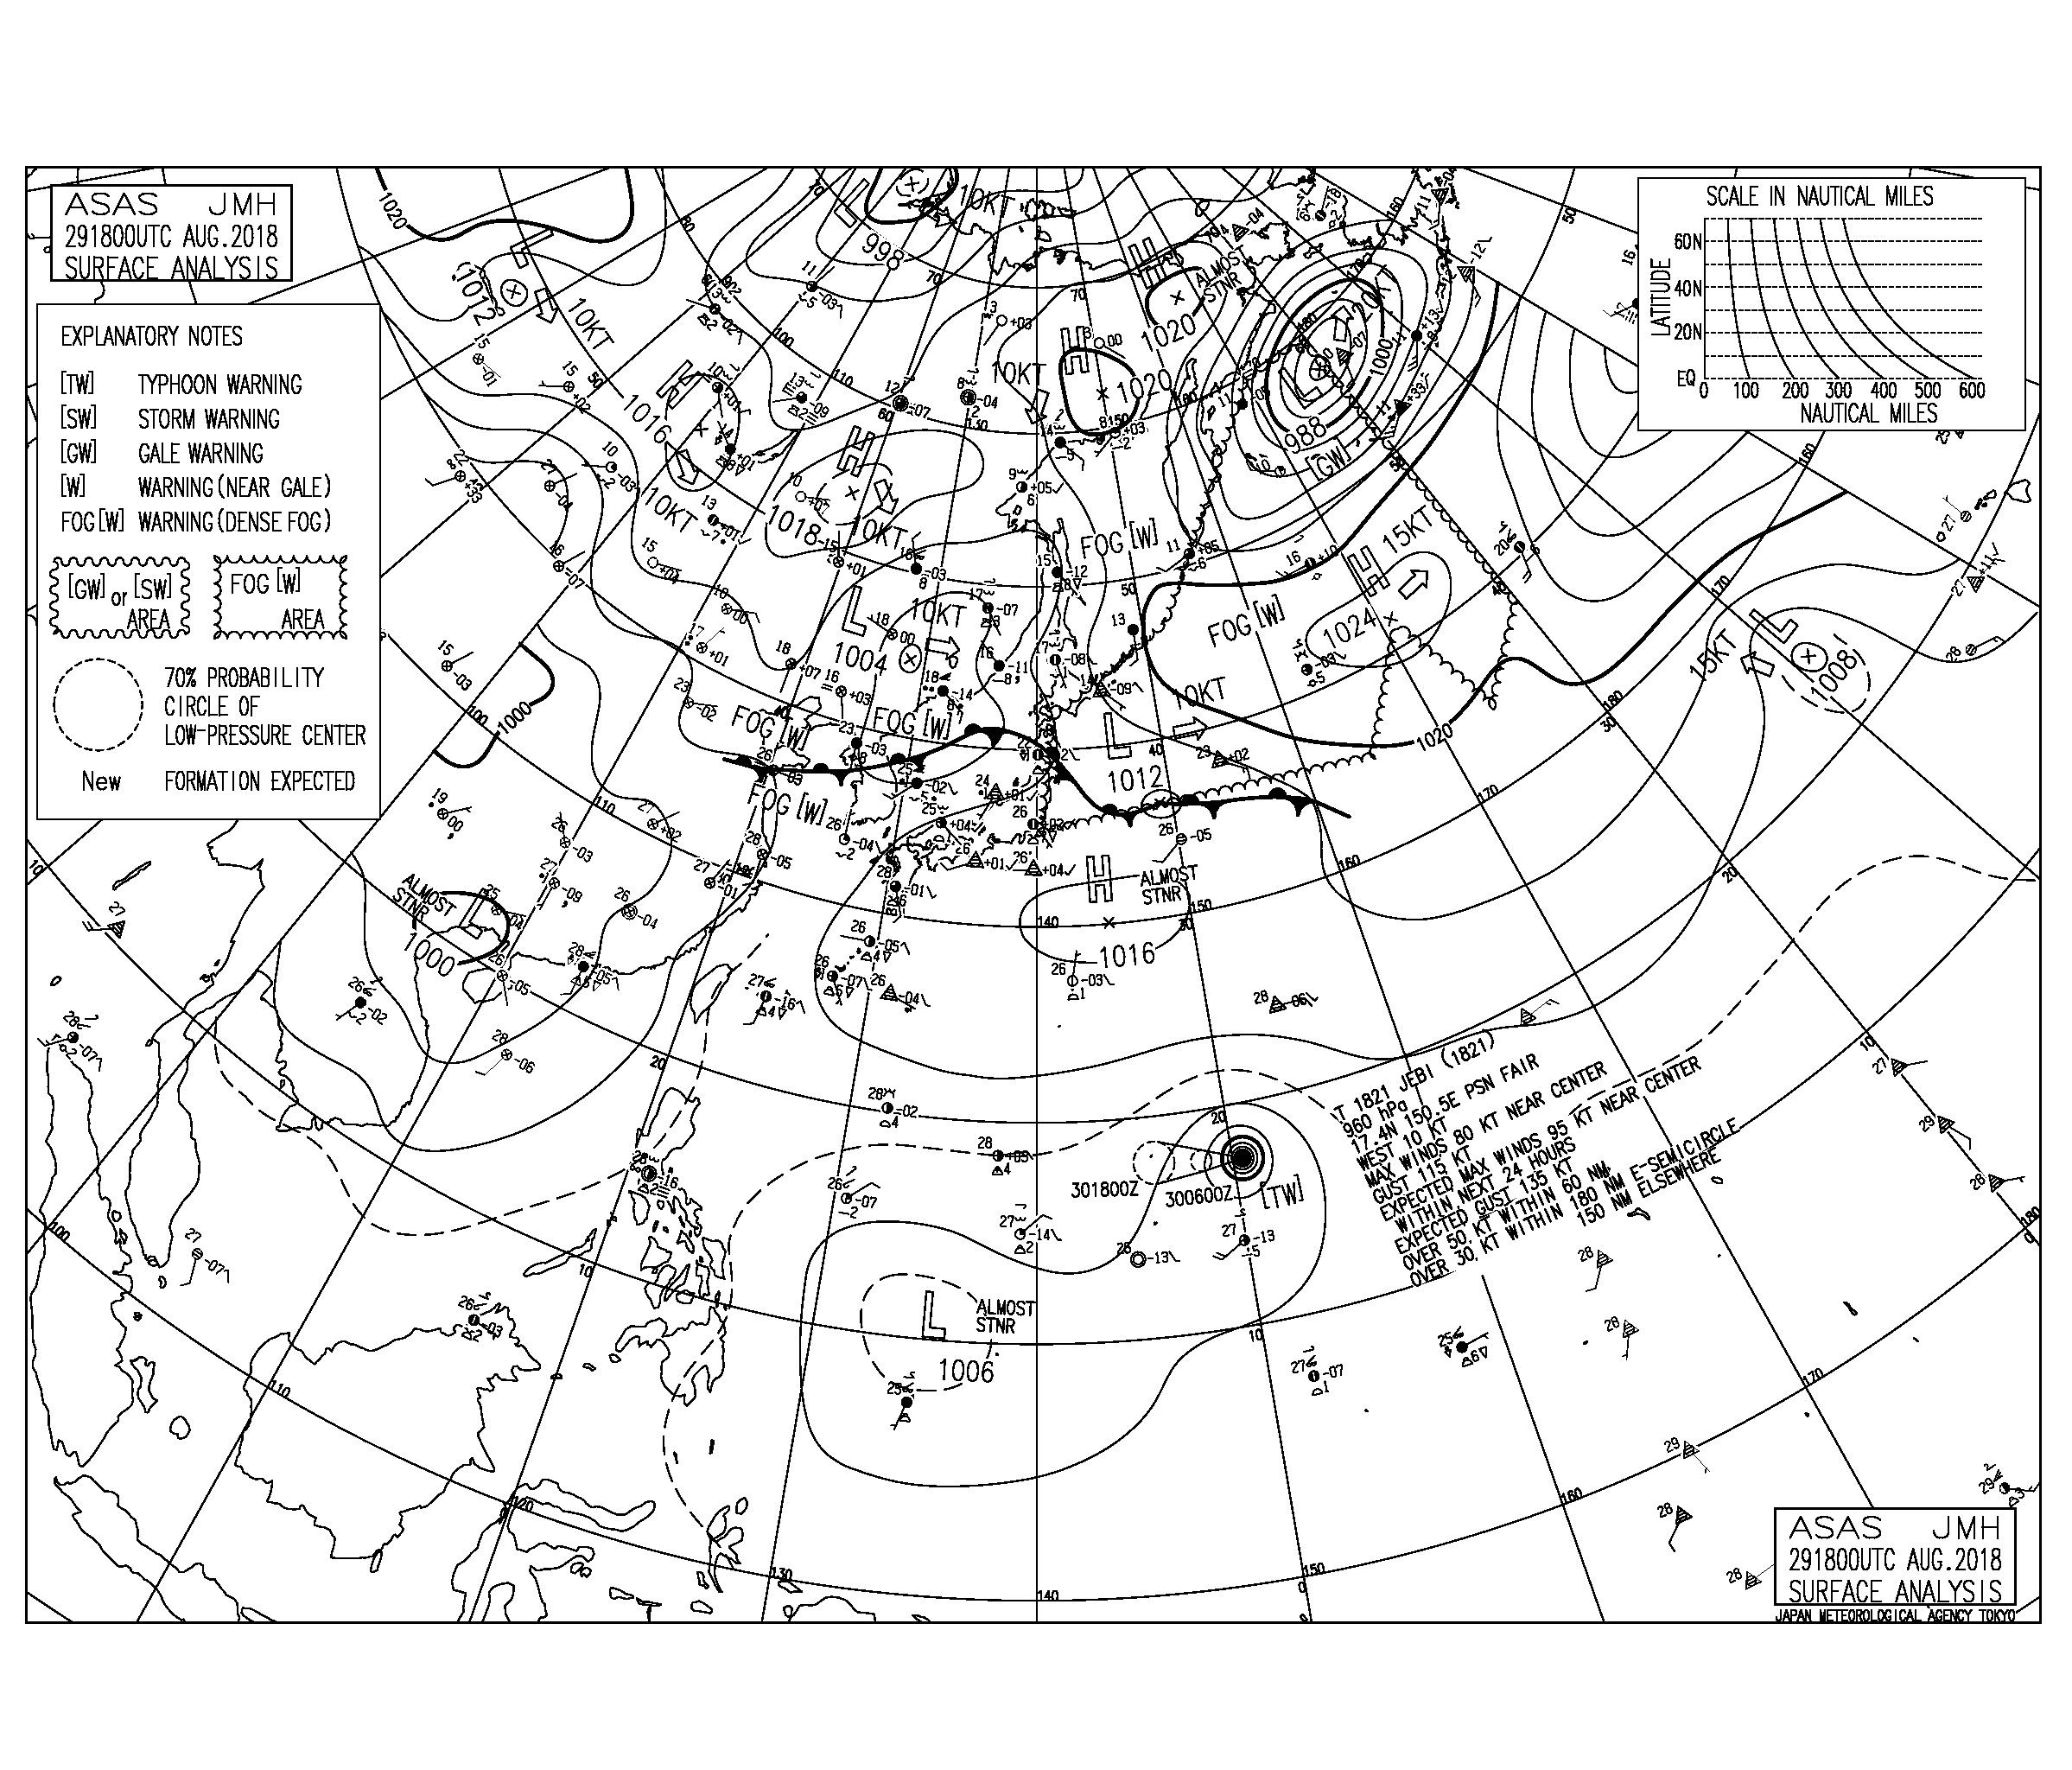 8/30 3:00 ASAS 気圧配置と波情報~台風21号は猛烈な台風になりそう、うねりは土曜の午後から反応しそうか